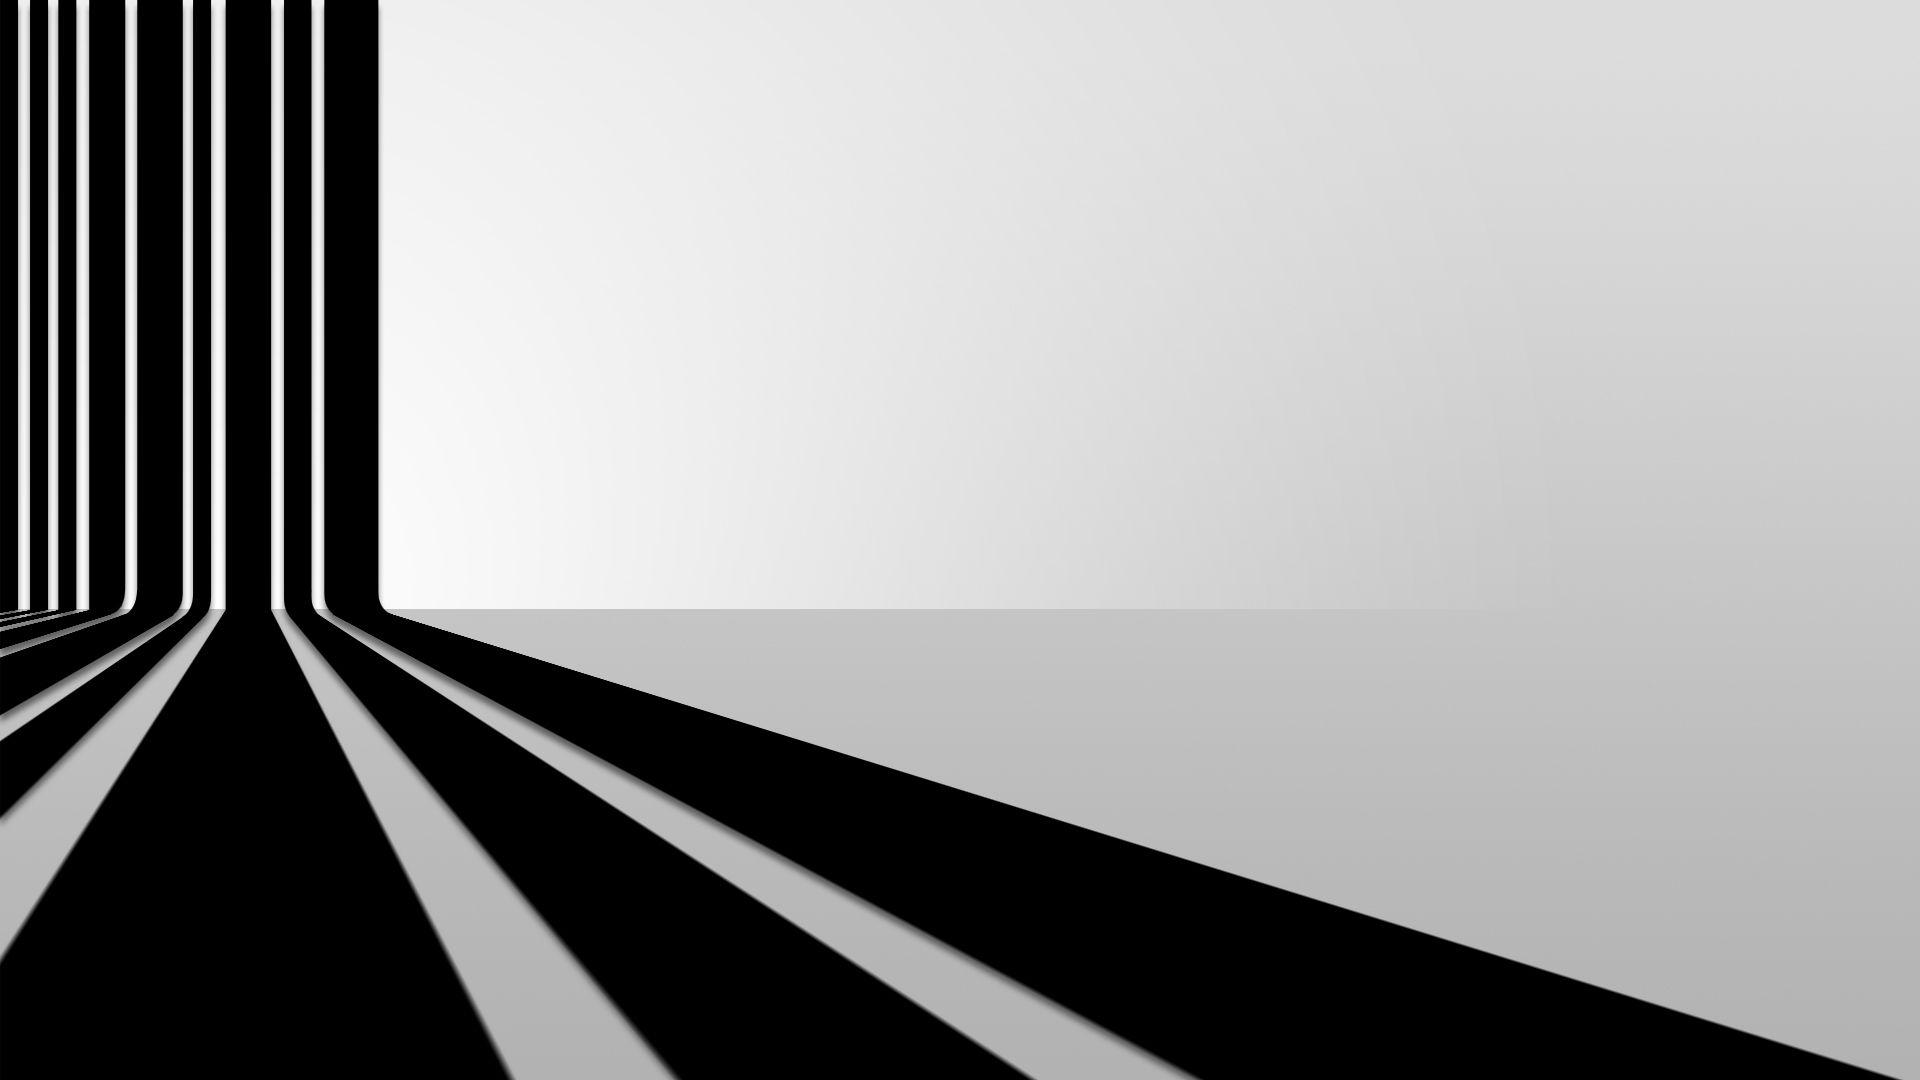 White Background Wallpaper Hd Best Wallpaper Hd Black Hd Wallpaper Black And White Wallpaper Black And White Background